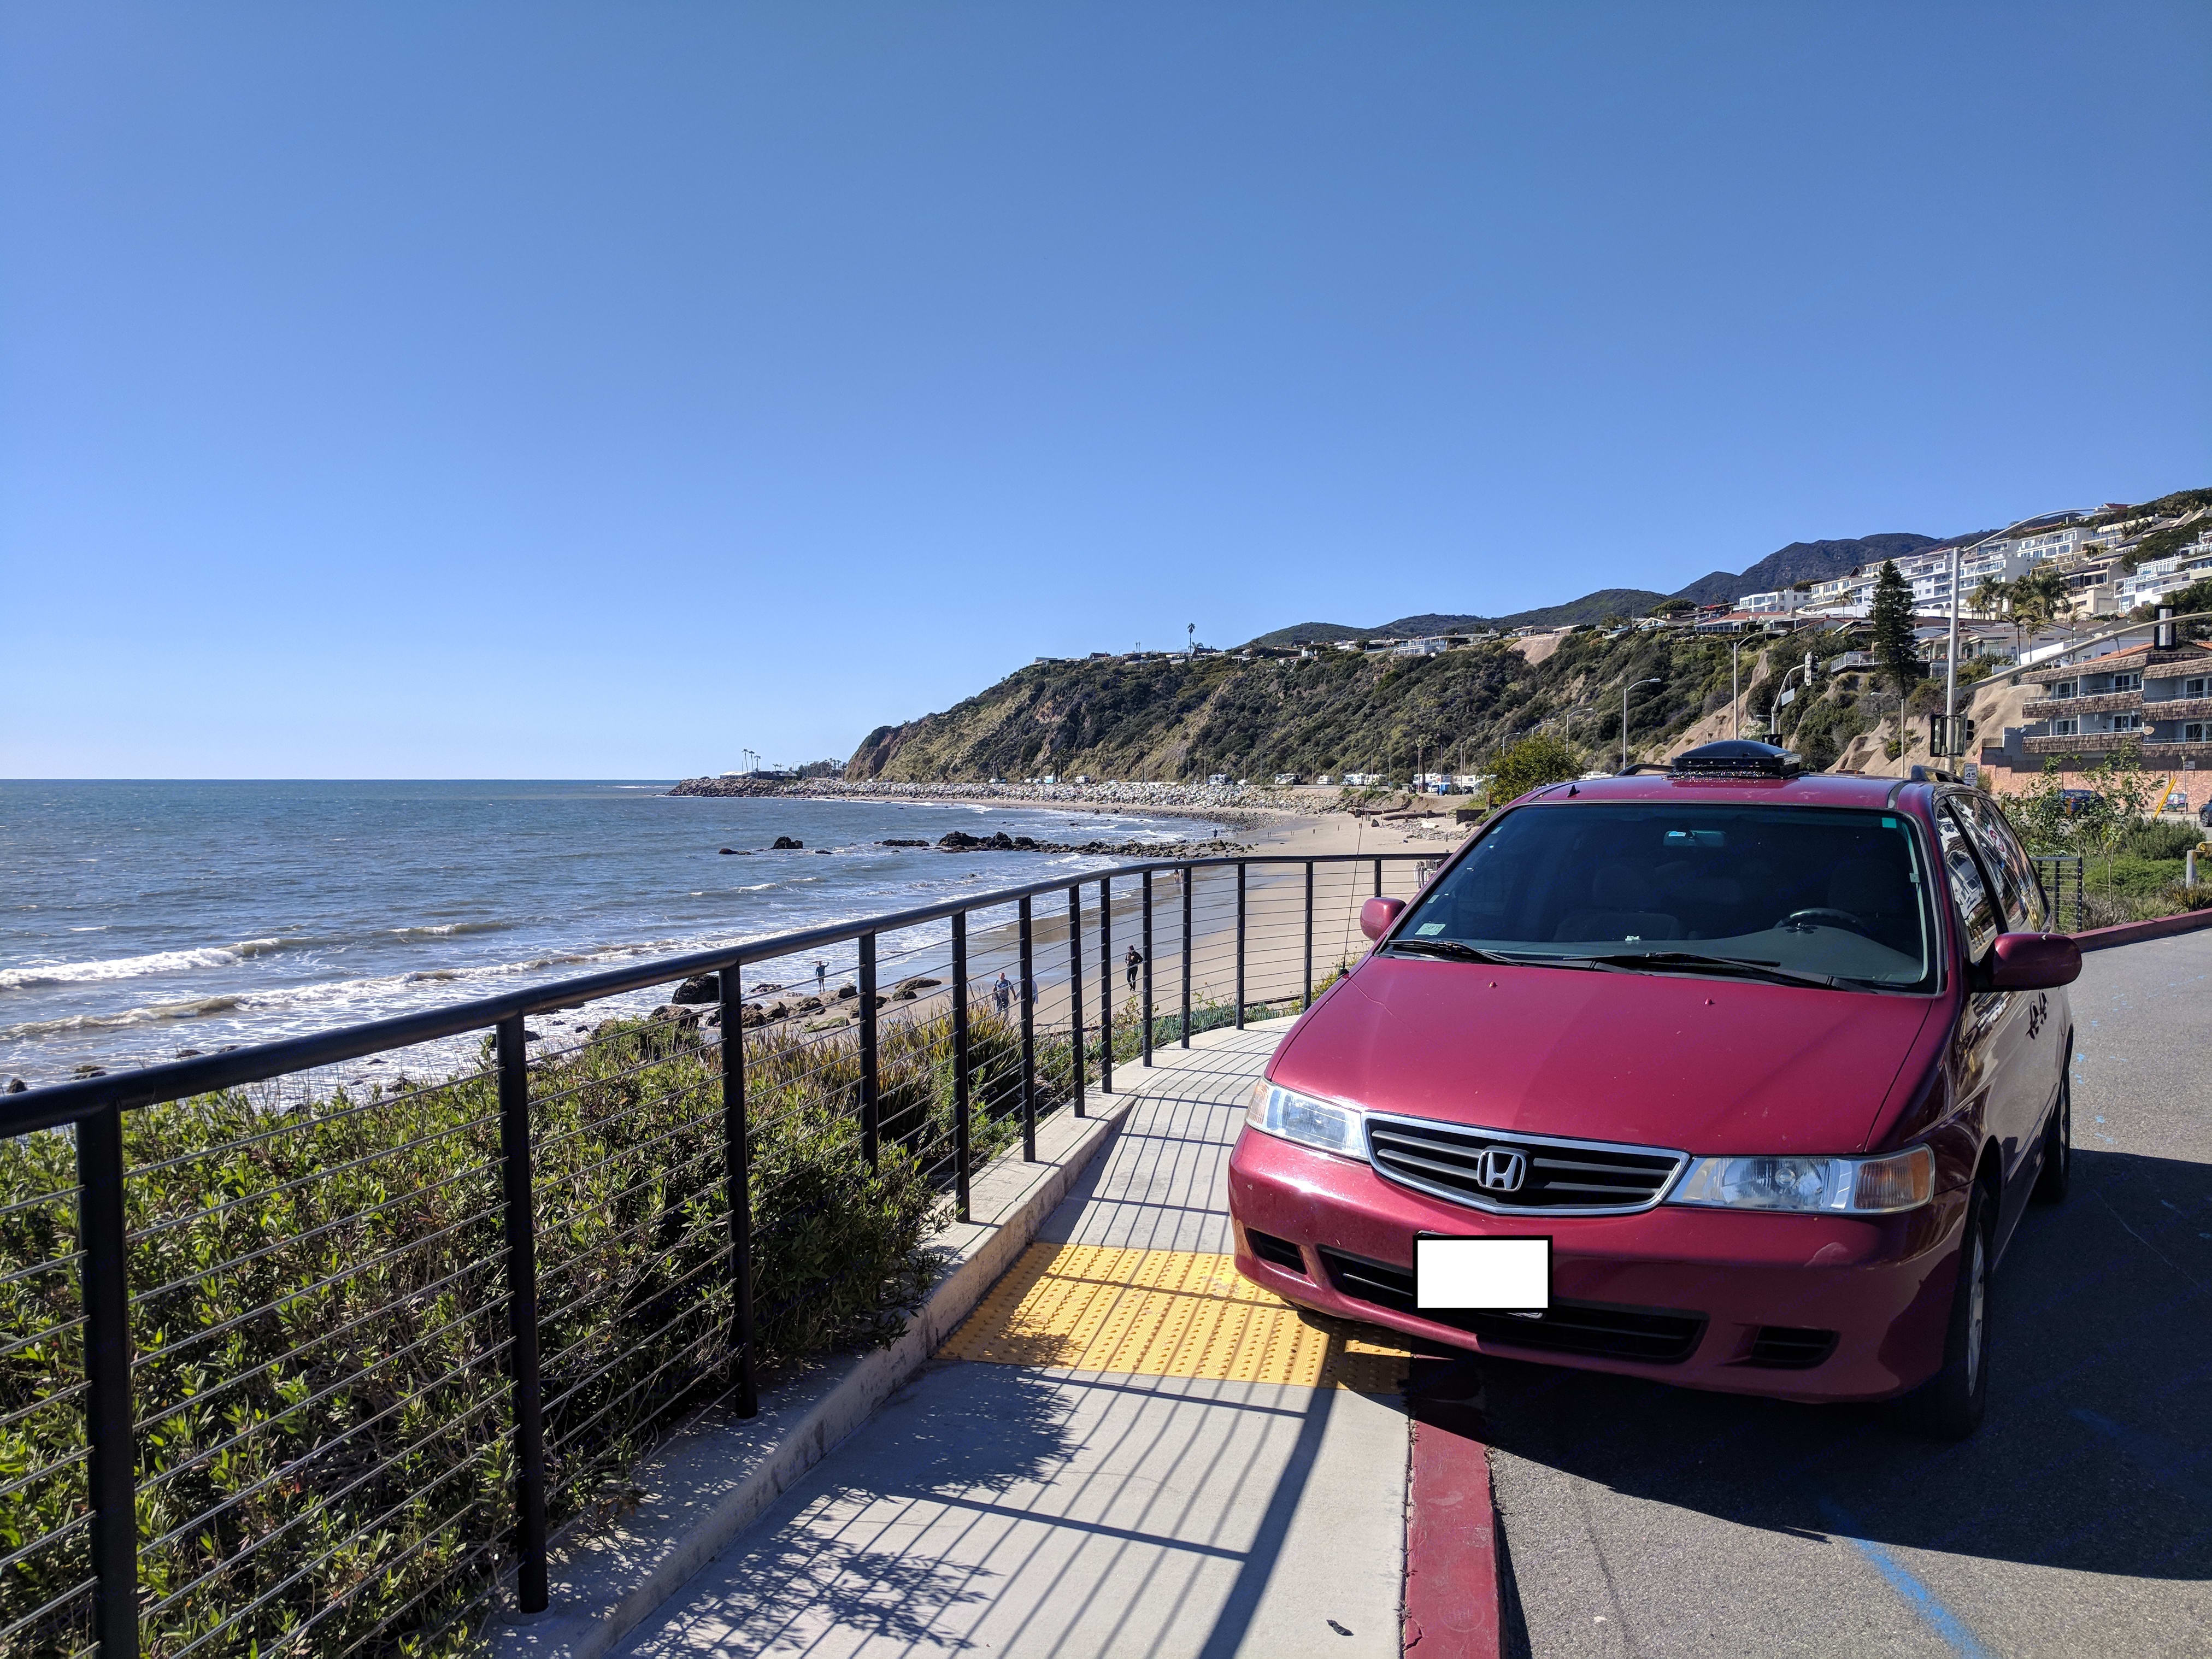 On a trip to Malibu. Honda Ody 2002